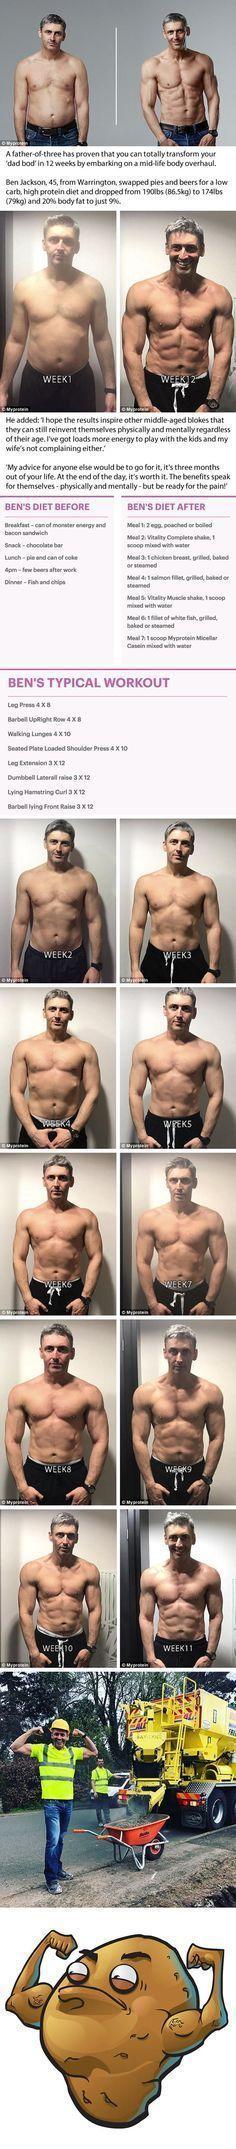 1500 calorie diet plan for 7 days